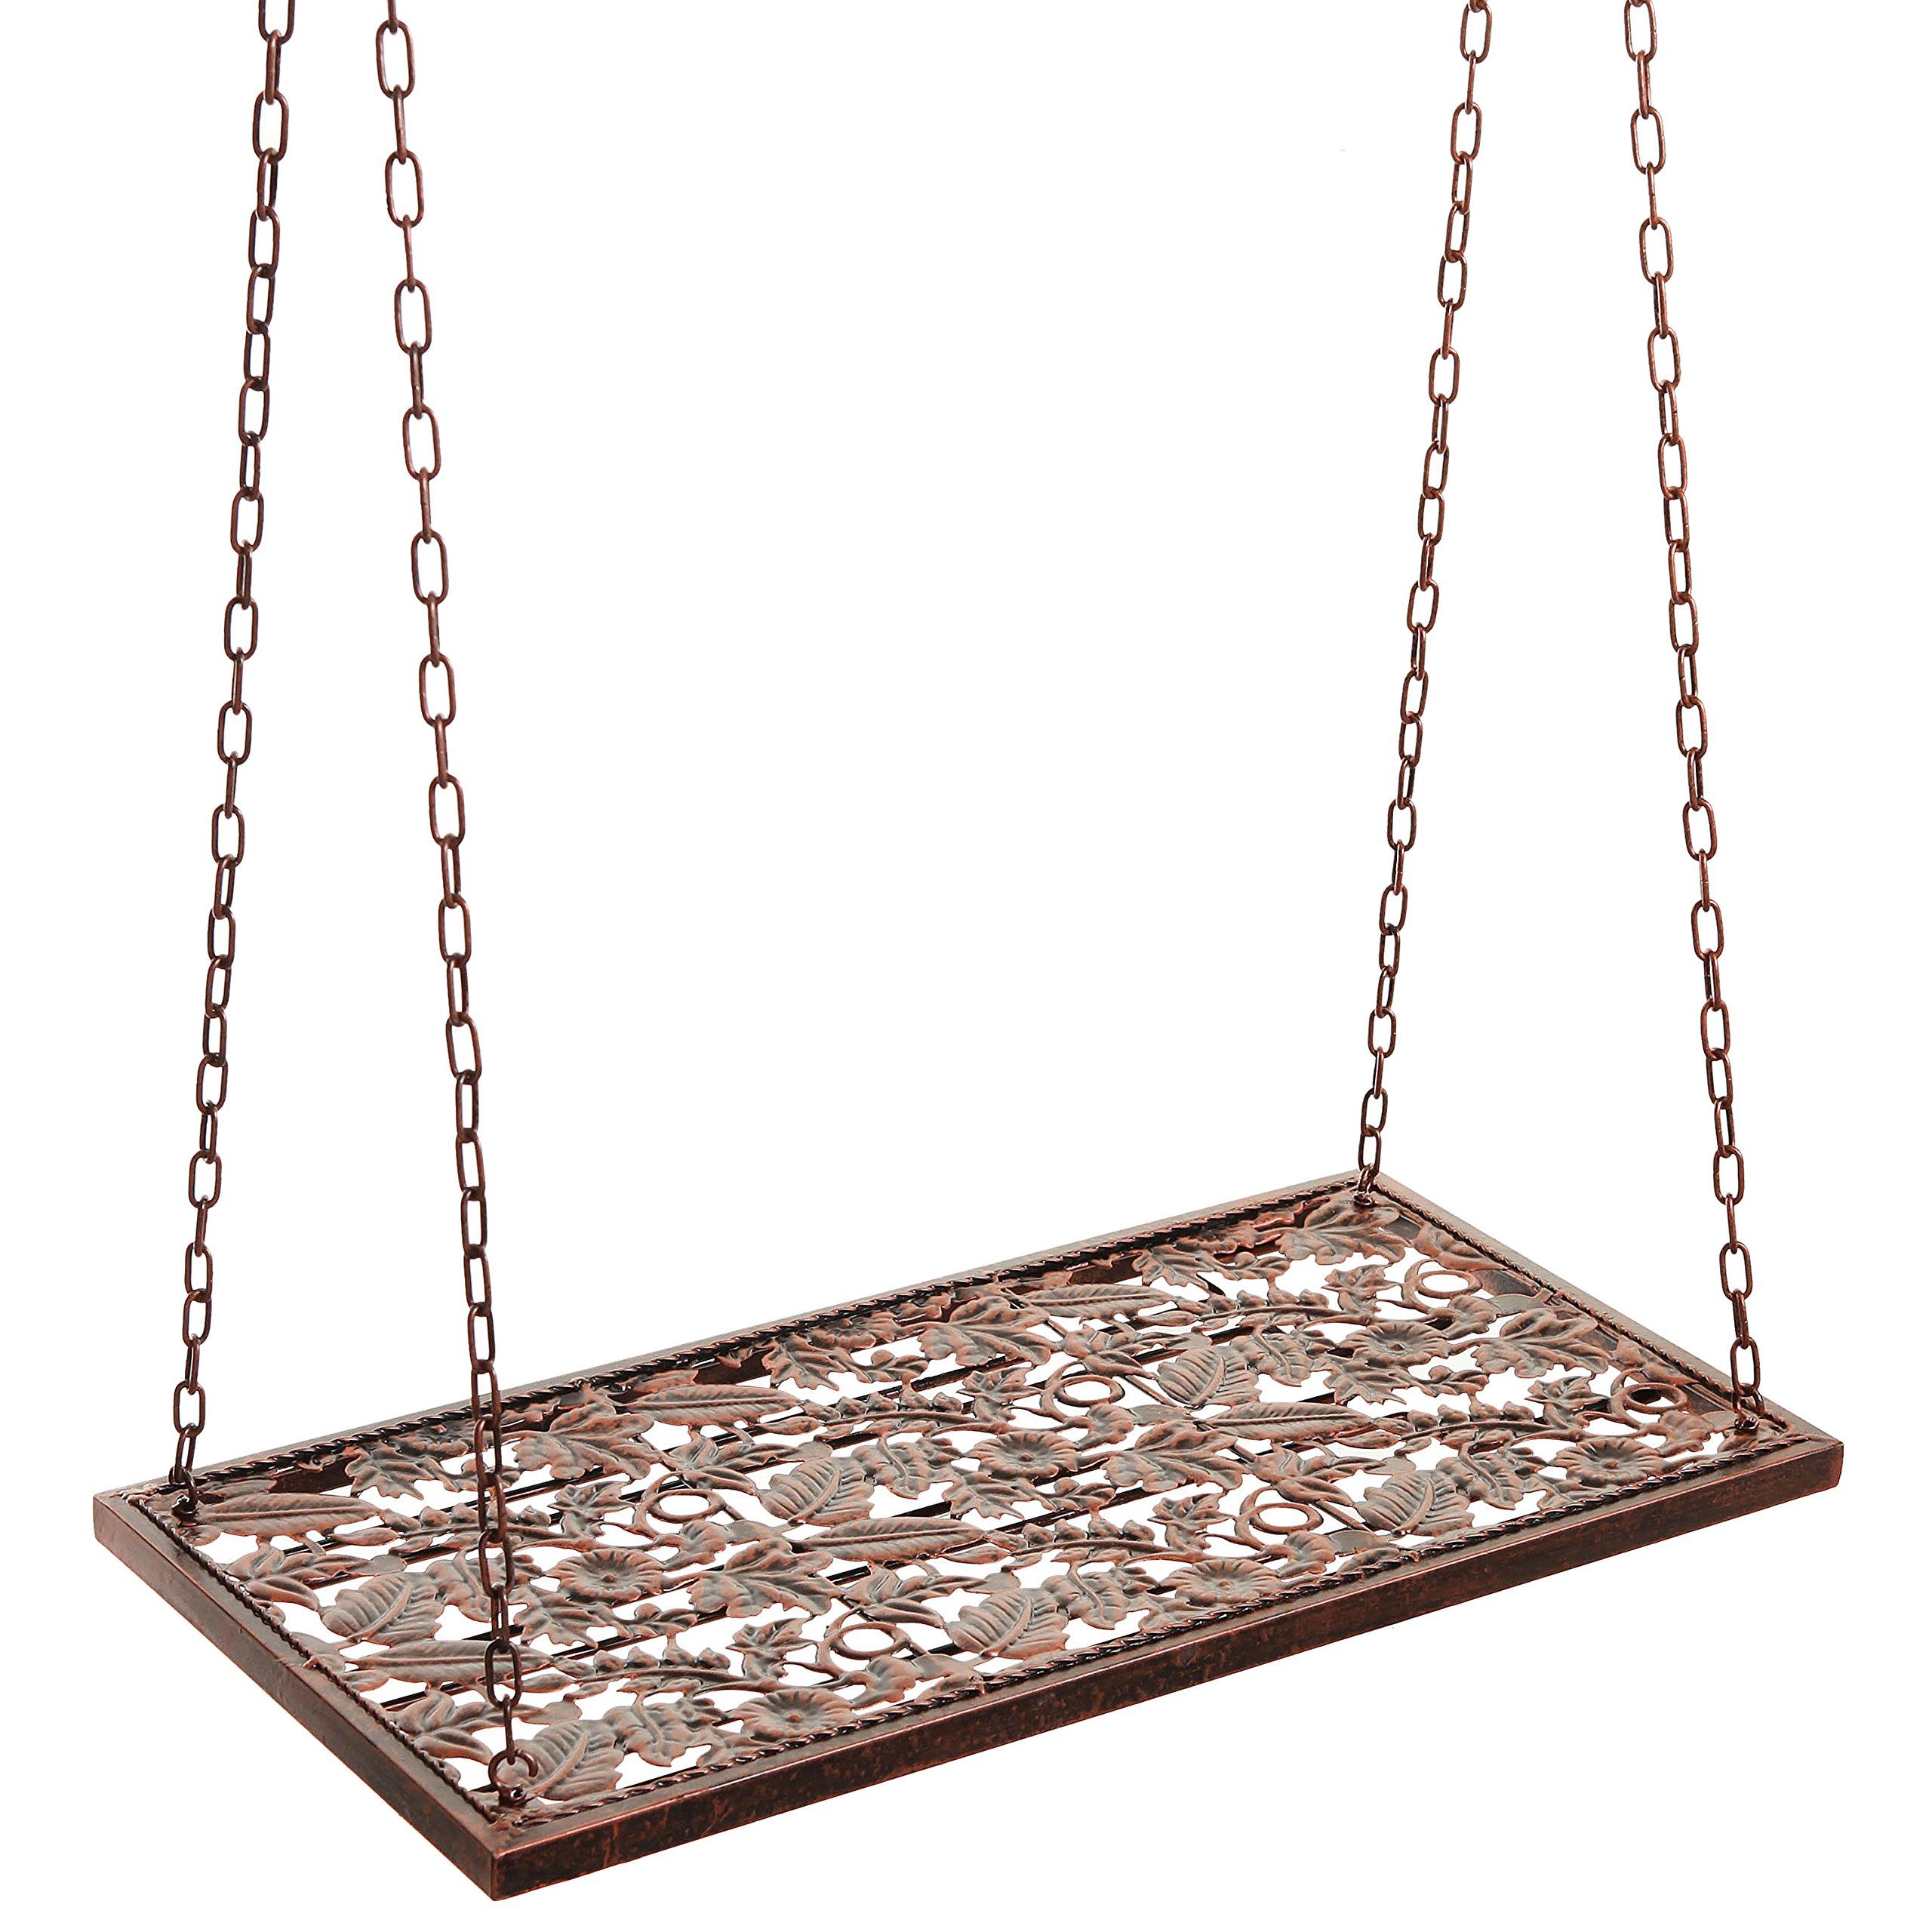 Vineyard Country Rustic Bronze Metal Ceiling Mounted Hanging Stemware Wine Glass Hanger Organizer Rack by MyGift (Image #4)